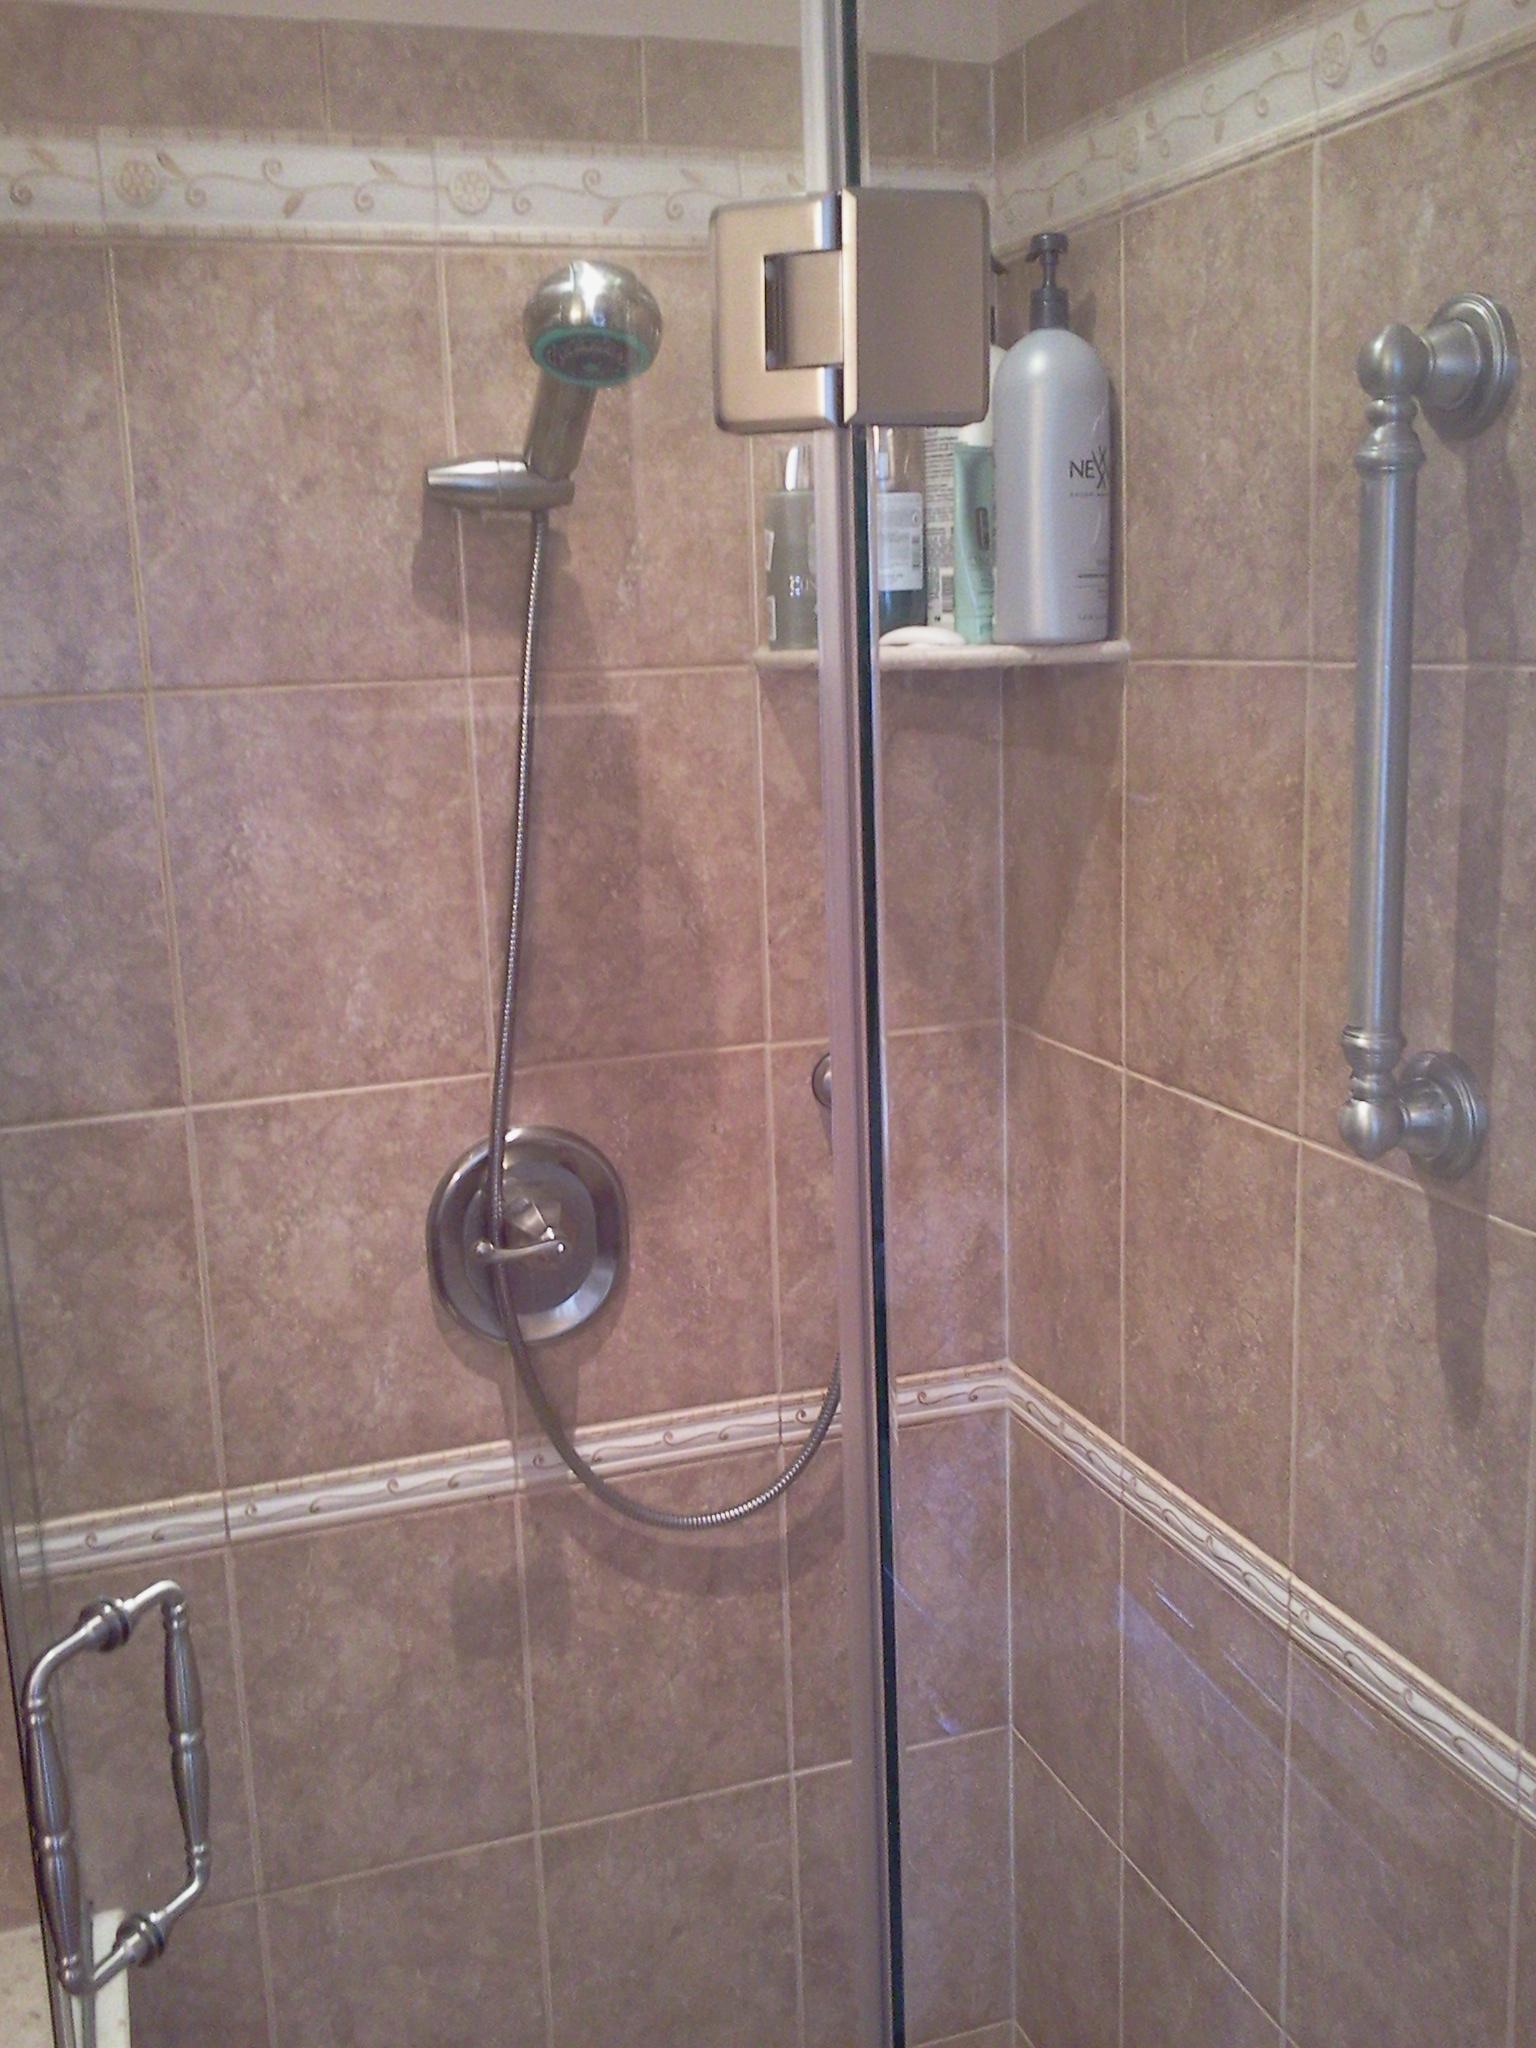 Tnl Home Improvements & Repairs